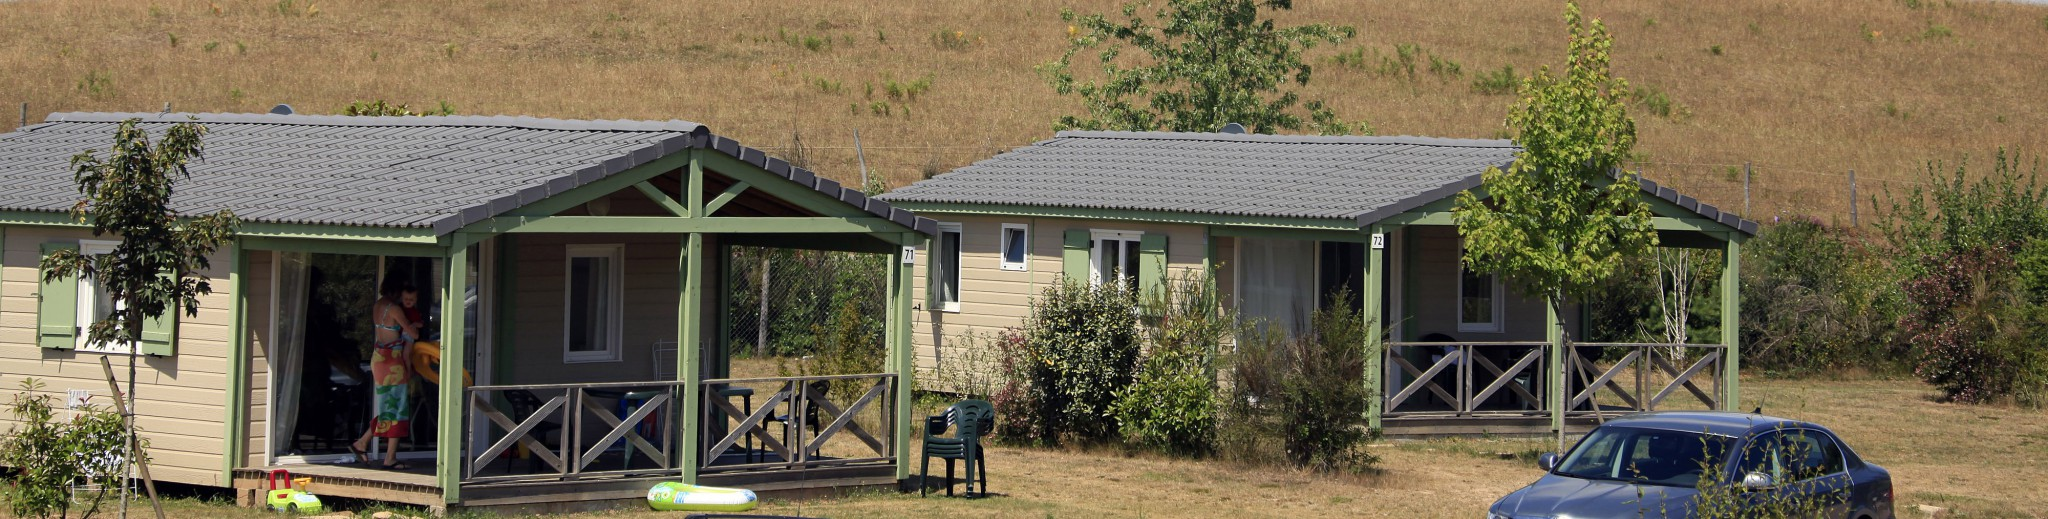 Camping Location vacances Correze Lot